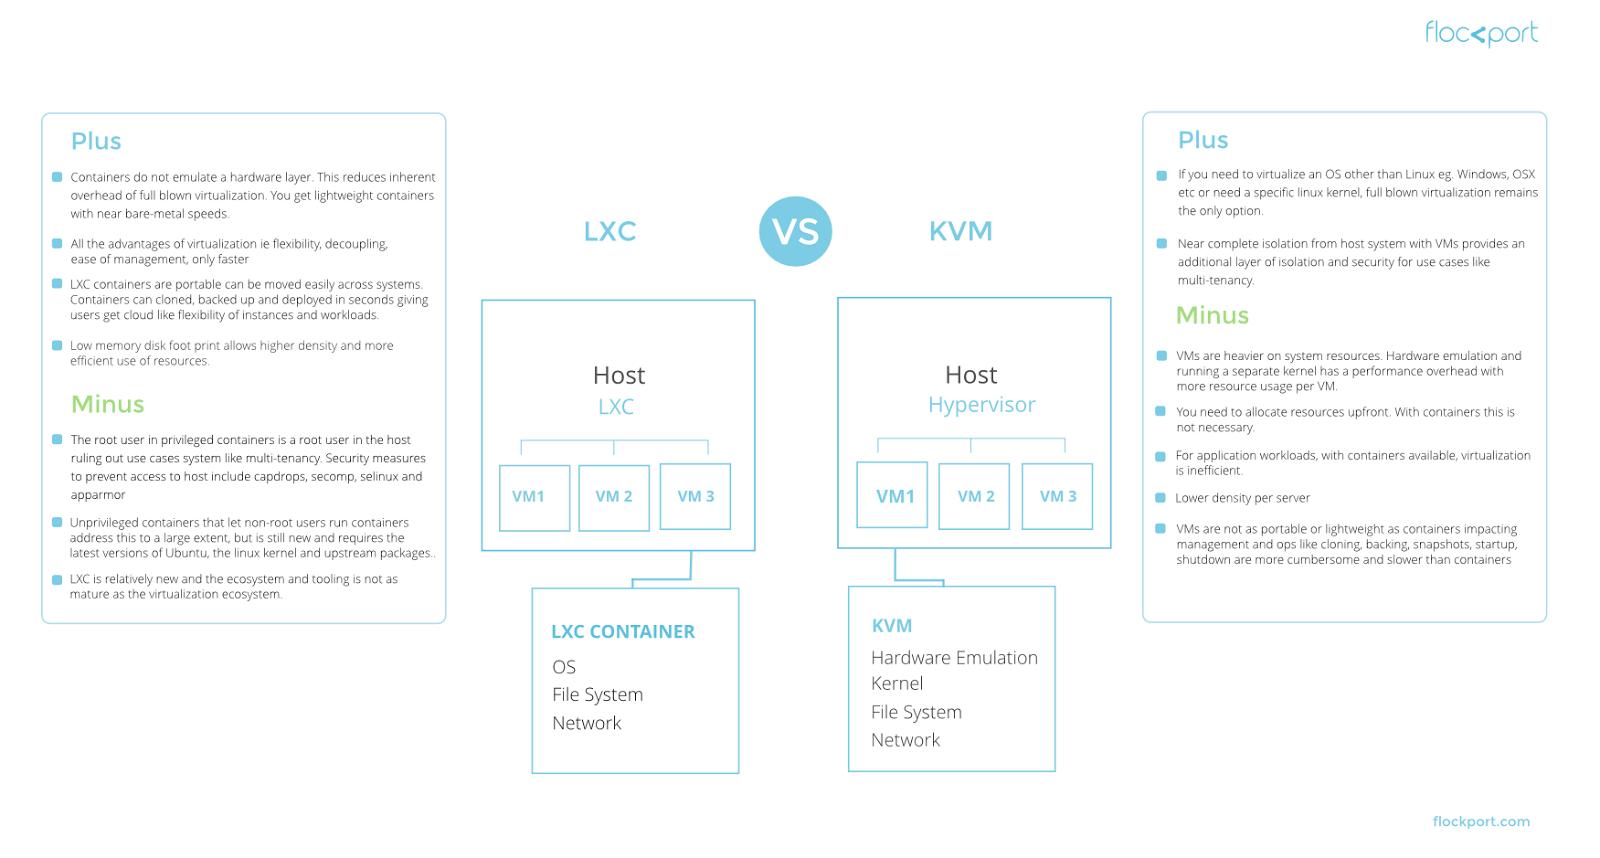 Programming Rants: LXC Web Panel